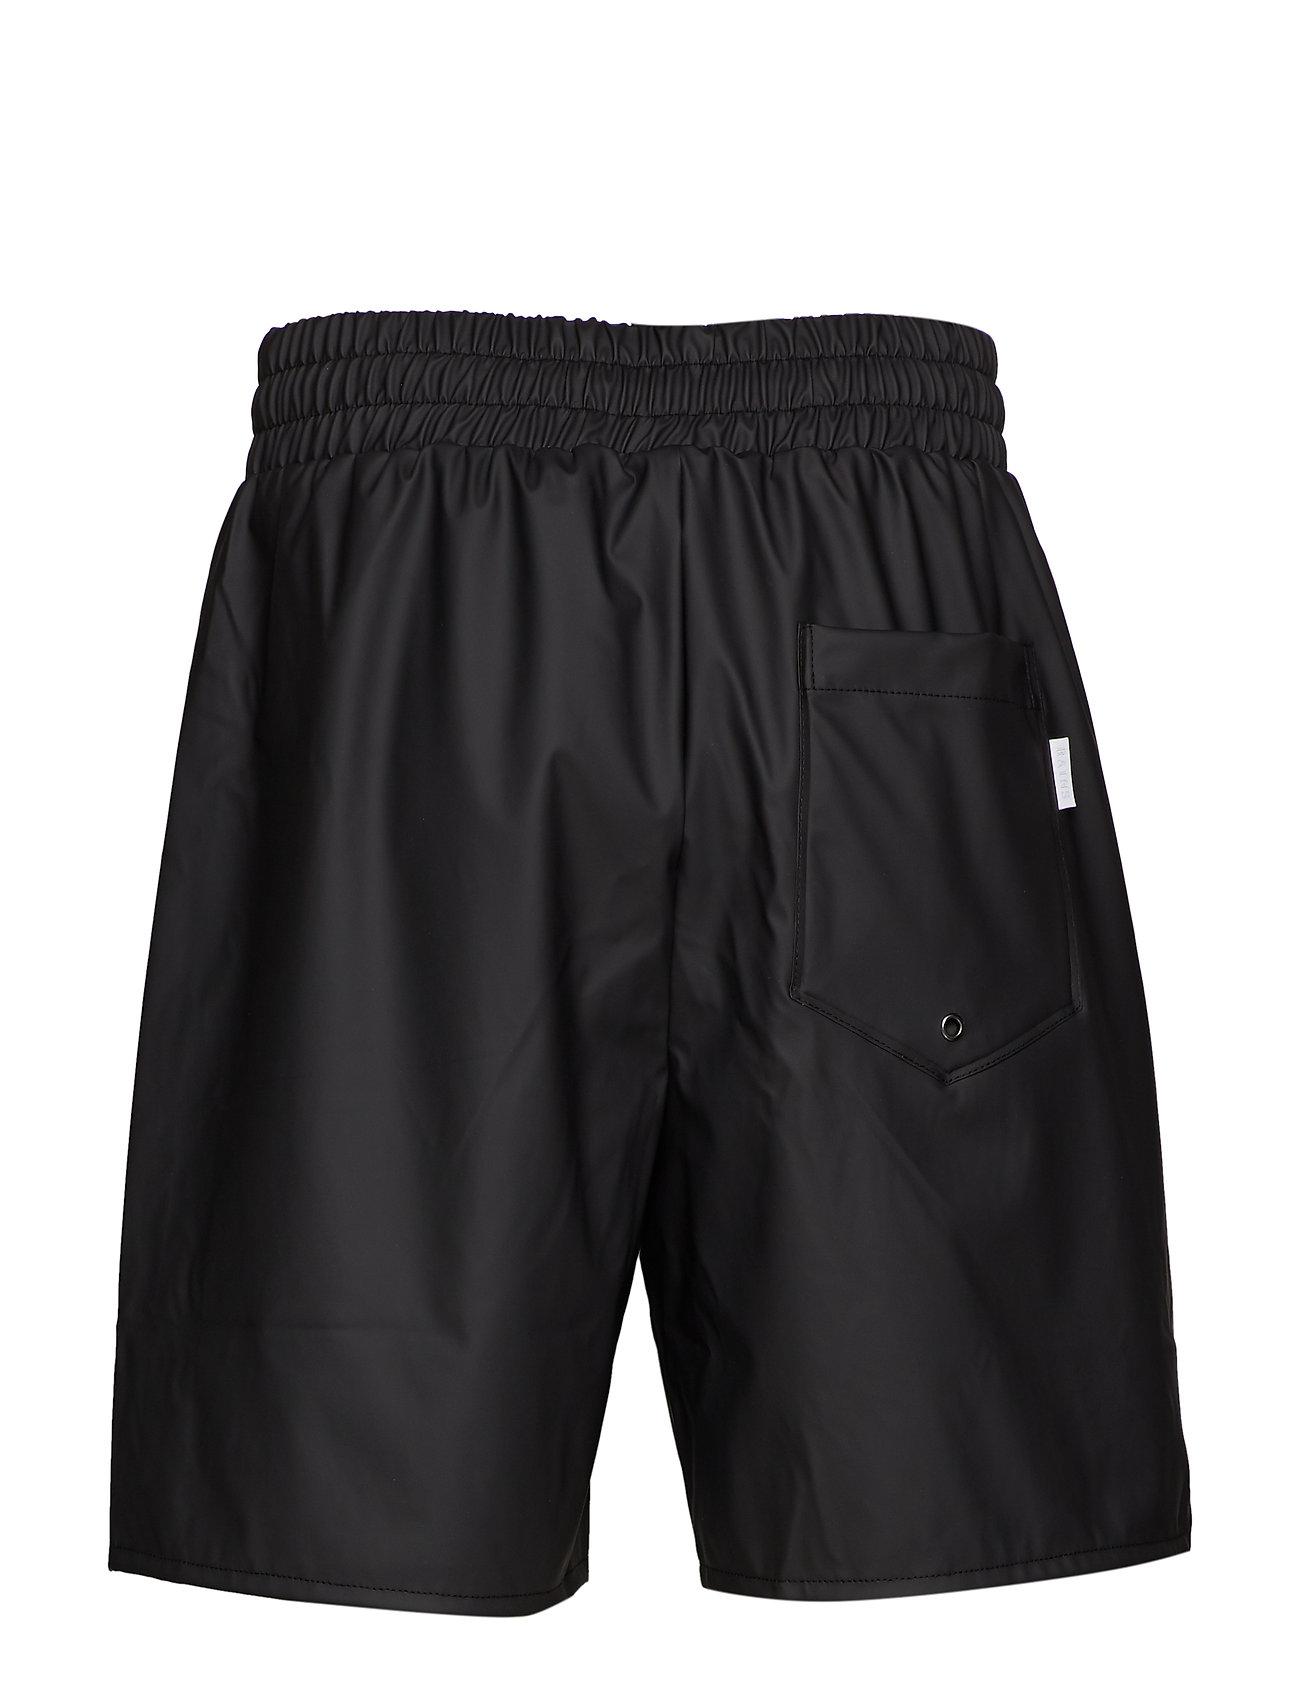 Shorts01 BlackRains Shorts01 Shorts01 Shorts01 BlackRains BlackRains BlackRains W29DHeEIY